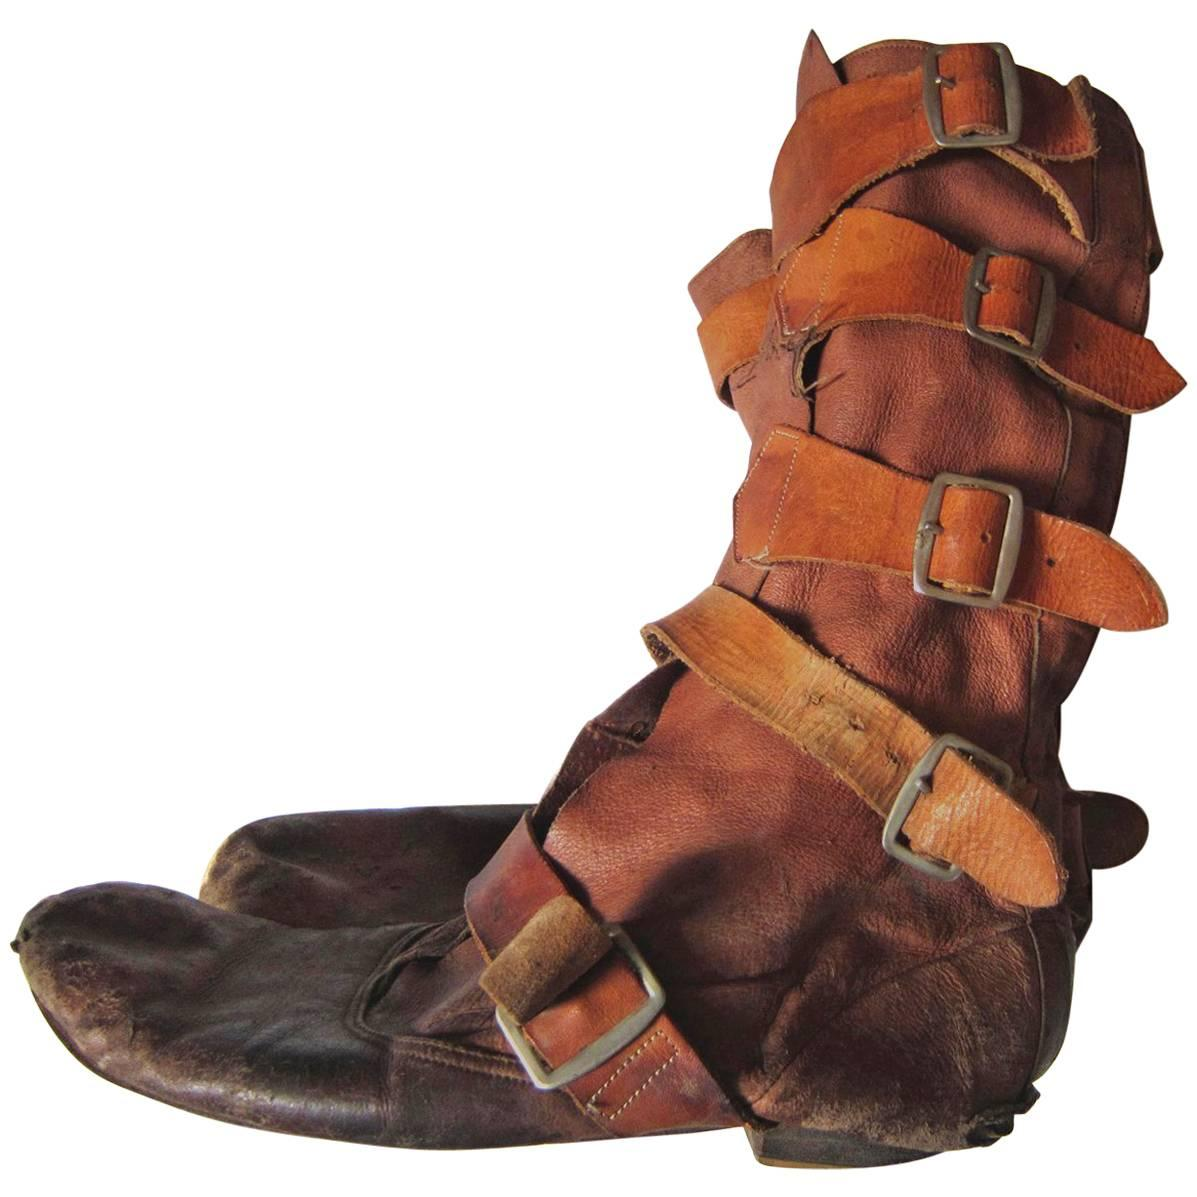 Worlds End Strap Boots Vivienne Westwood / Malcolm Mclaren 1982-1983